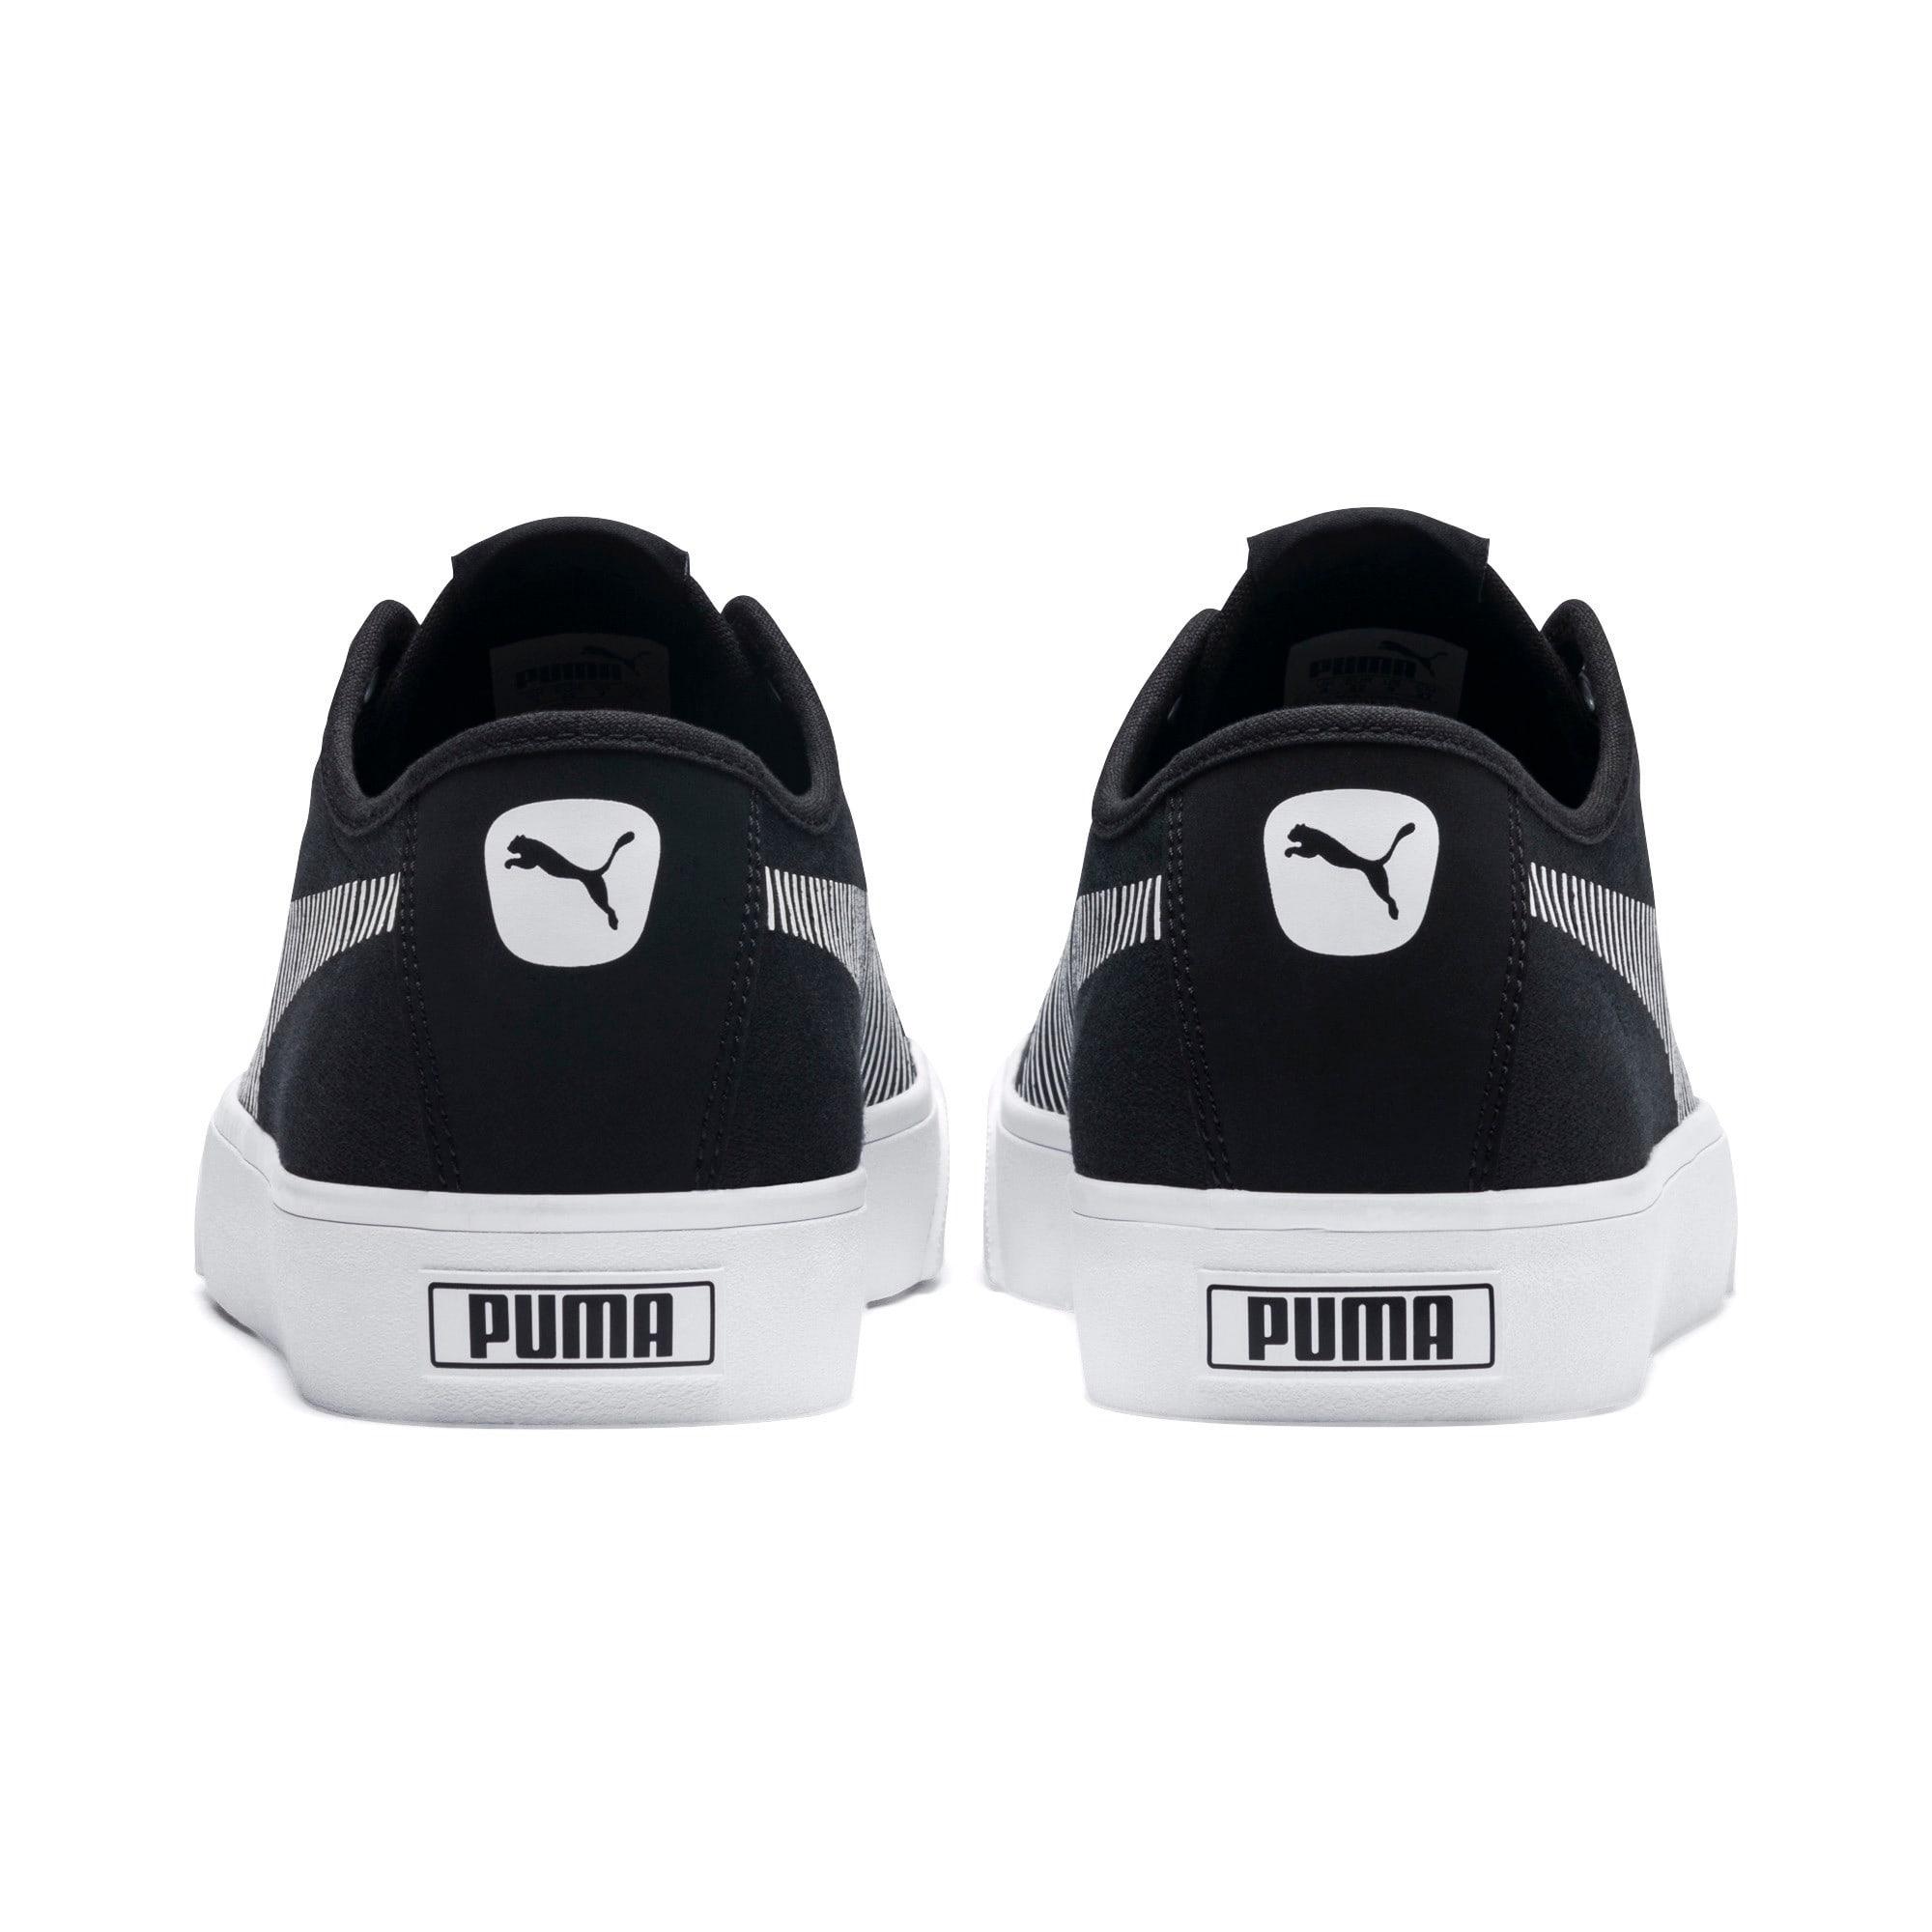 Thumbnail 4 of Bari Sneakers, Puma Black-Puma White, medium